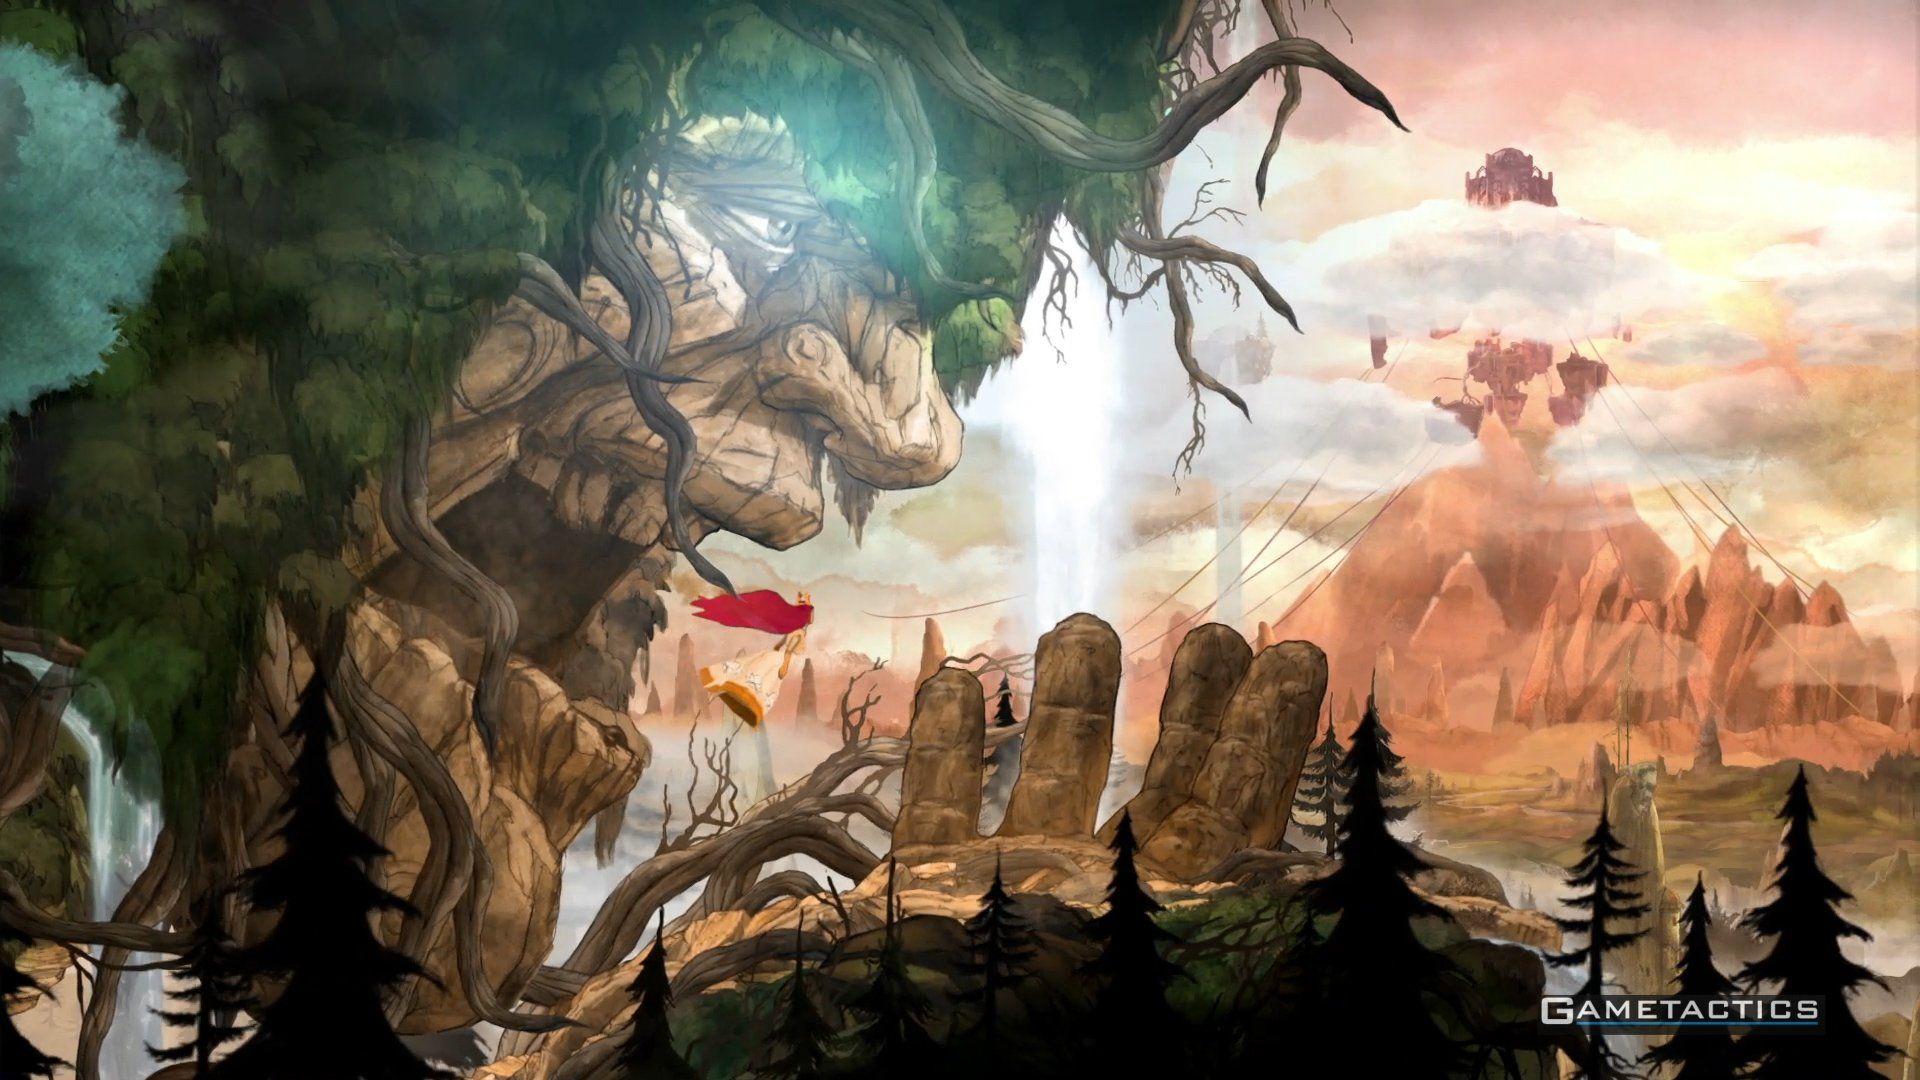 Video Game Child Of Light Child Of Light Wallpaper In 2020 Child Of Light Wallpaper Backgrounds Art